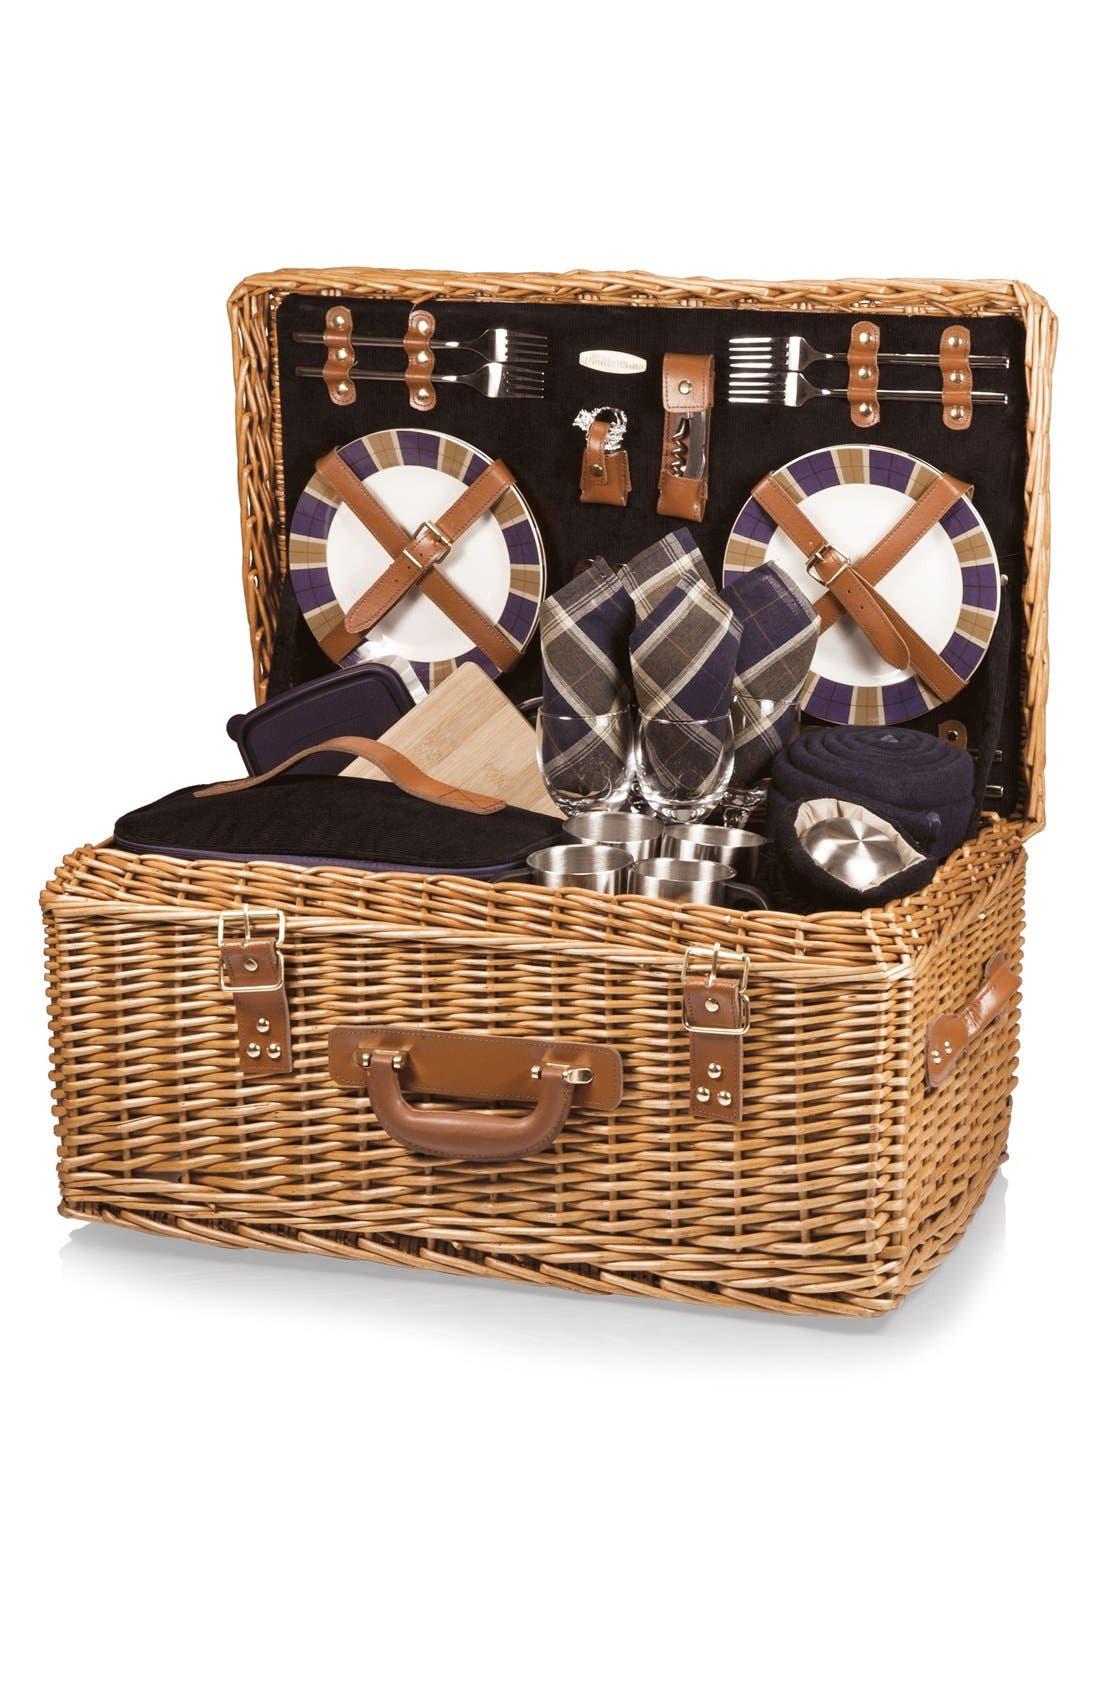 Main Image - Picnic Time 'Windsor' Wicker Picnic Basket